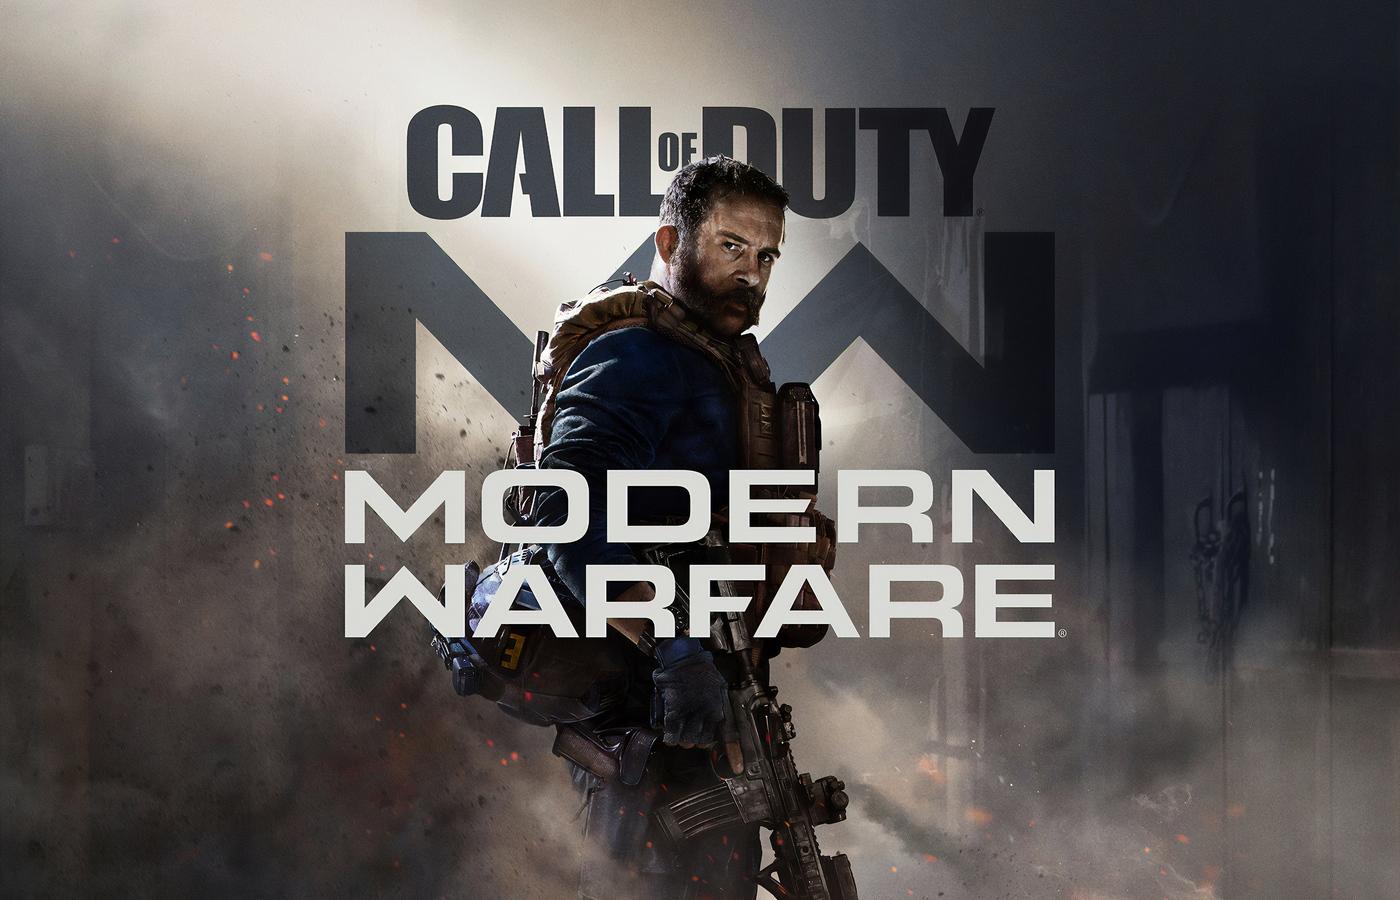 call-of-duty-modern-warfare-remastered-2019-4k-ow.jpg